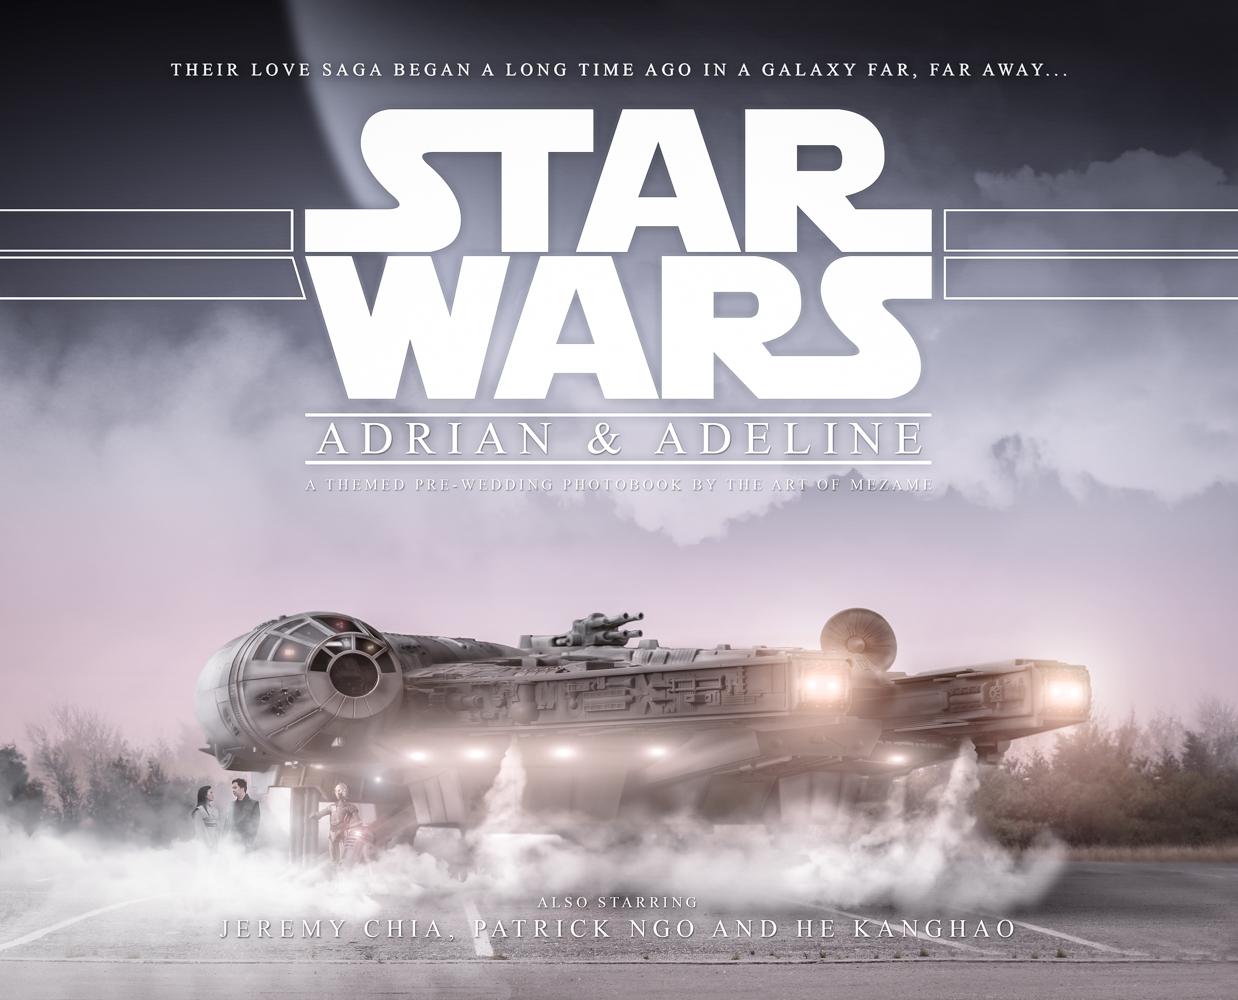 Star Wars: Adrian & Adeline   The Art of Mezame